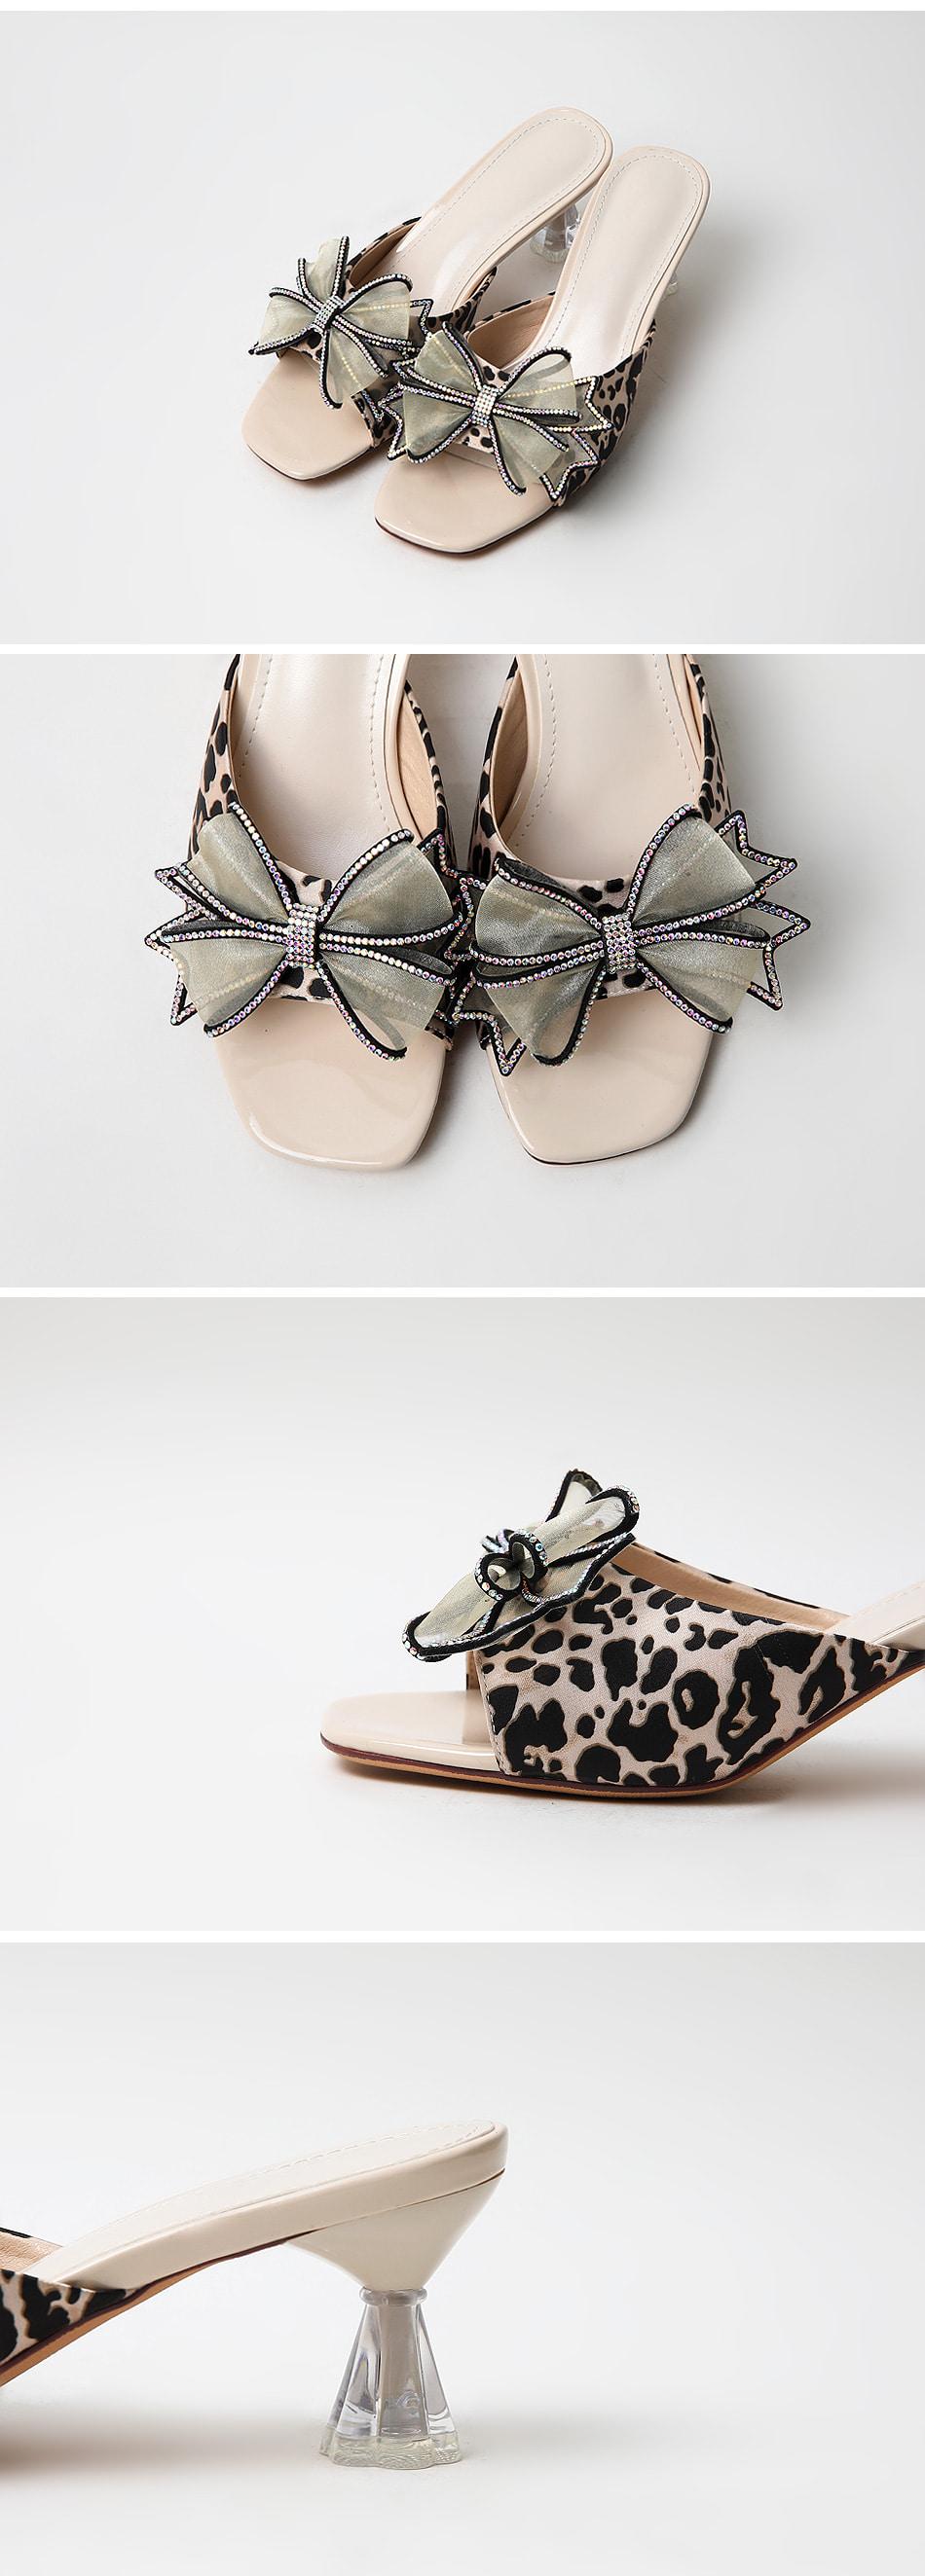 Heapia mules slippers 6cm